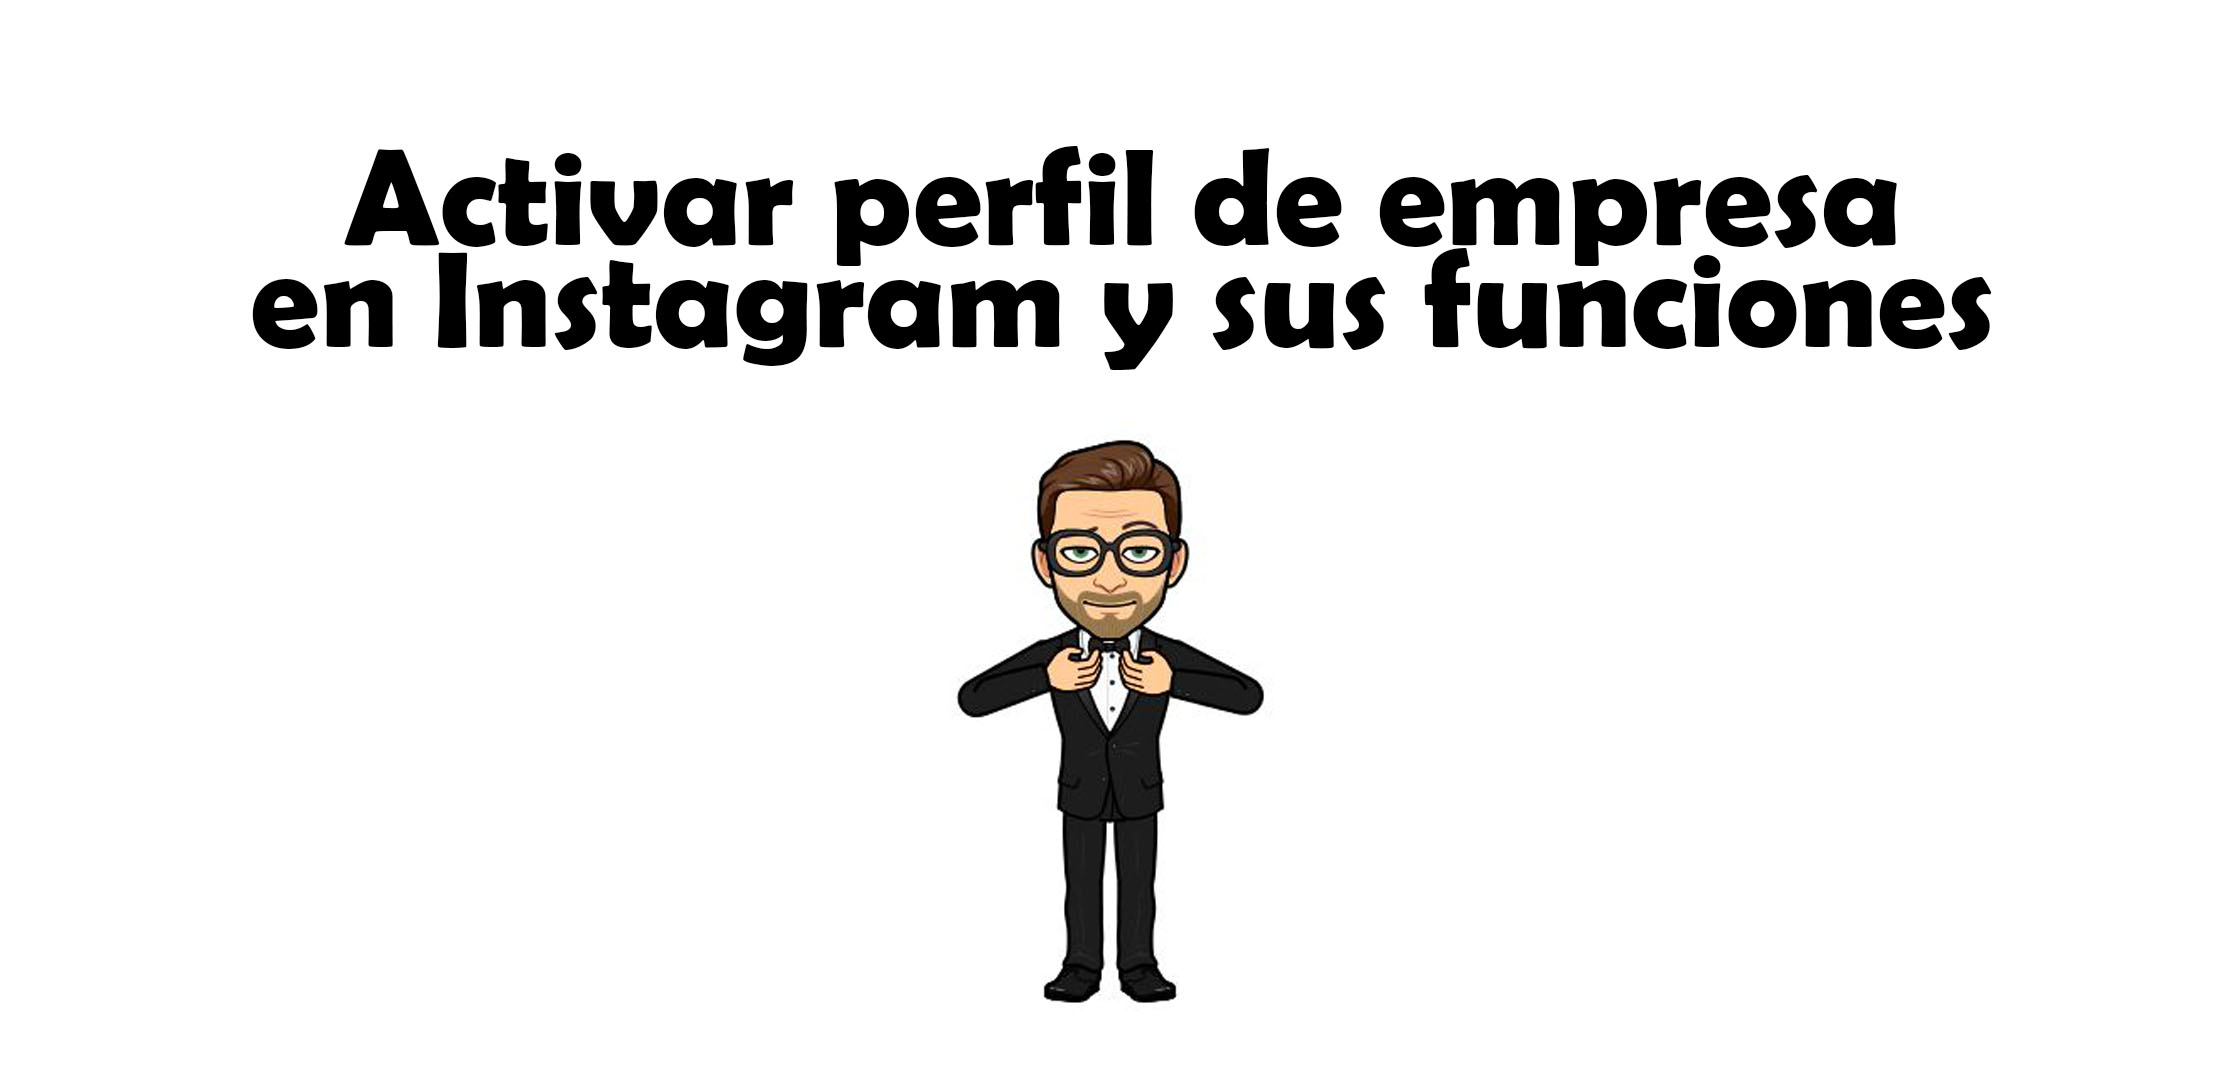 activar perfil de empresa en Instagram